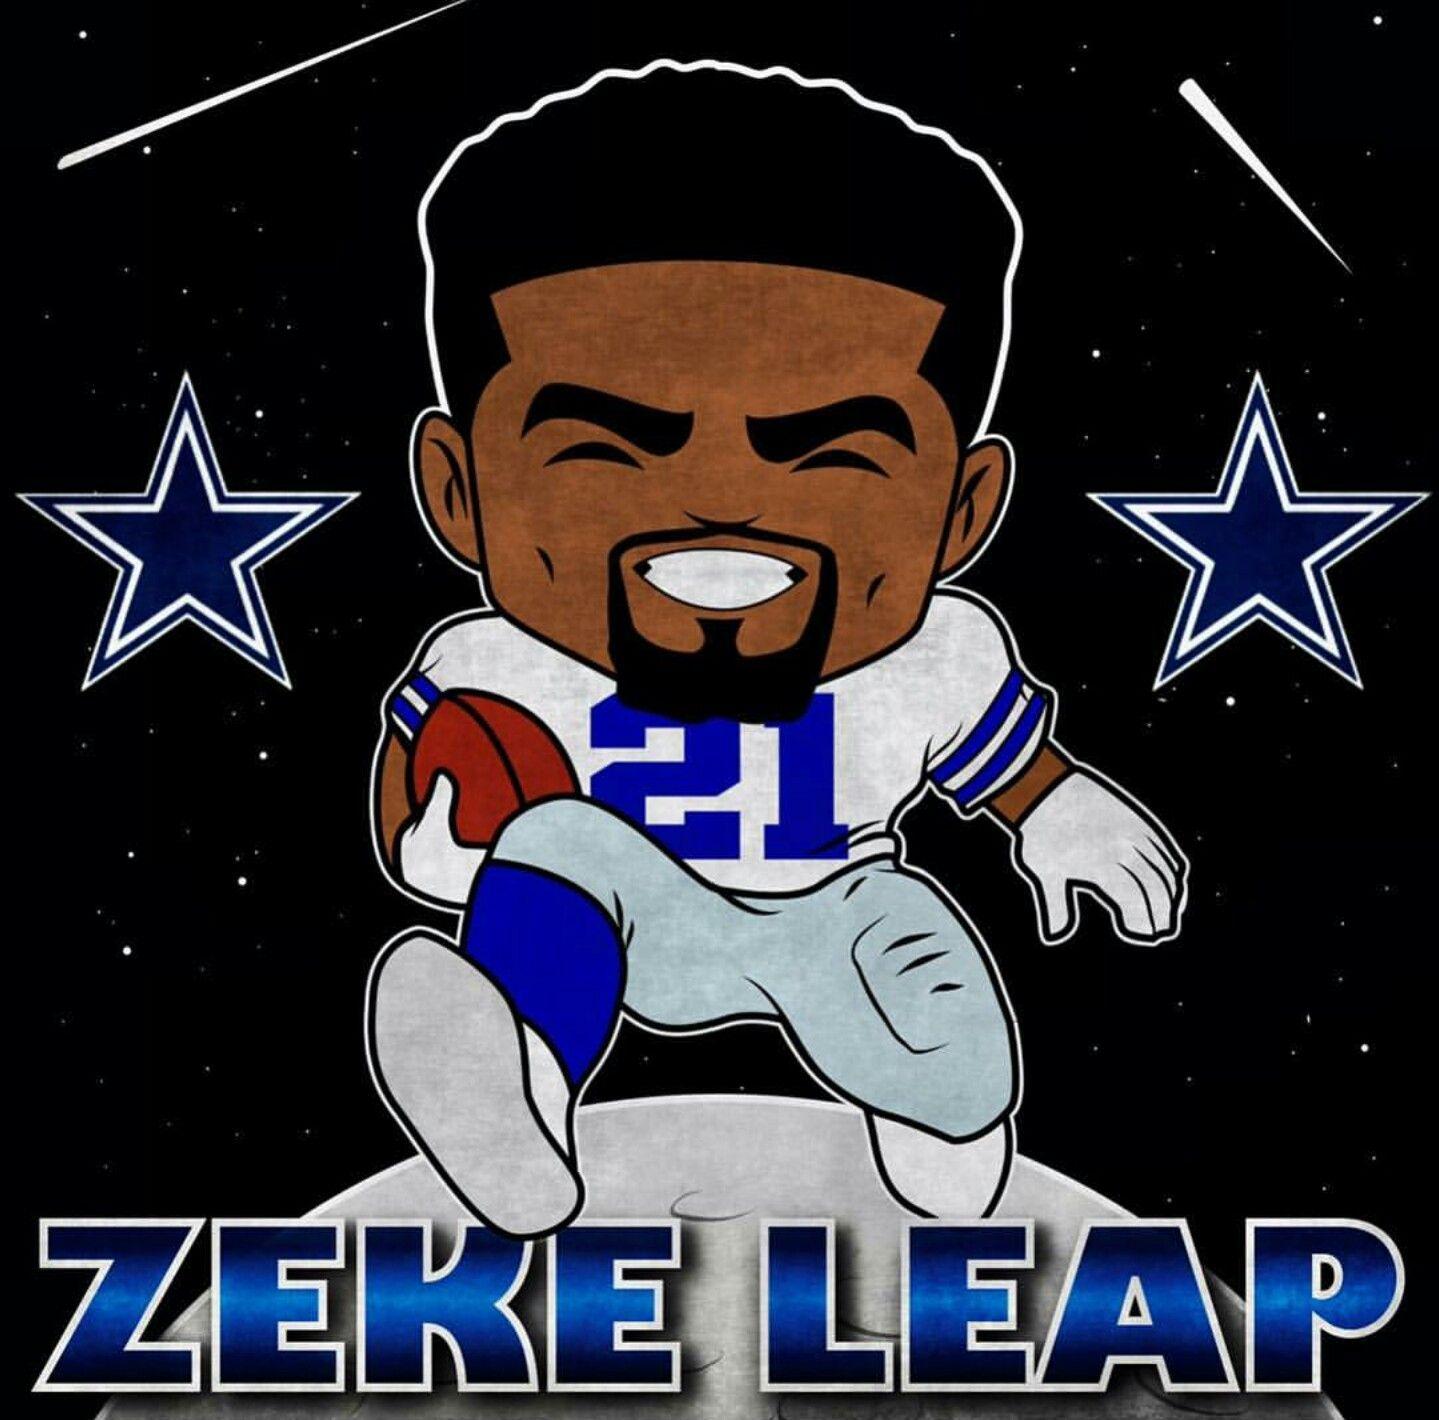 Dallas cowboys clipart zeke. The freak america s